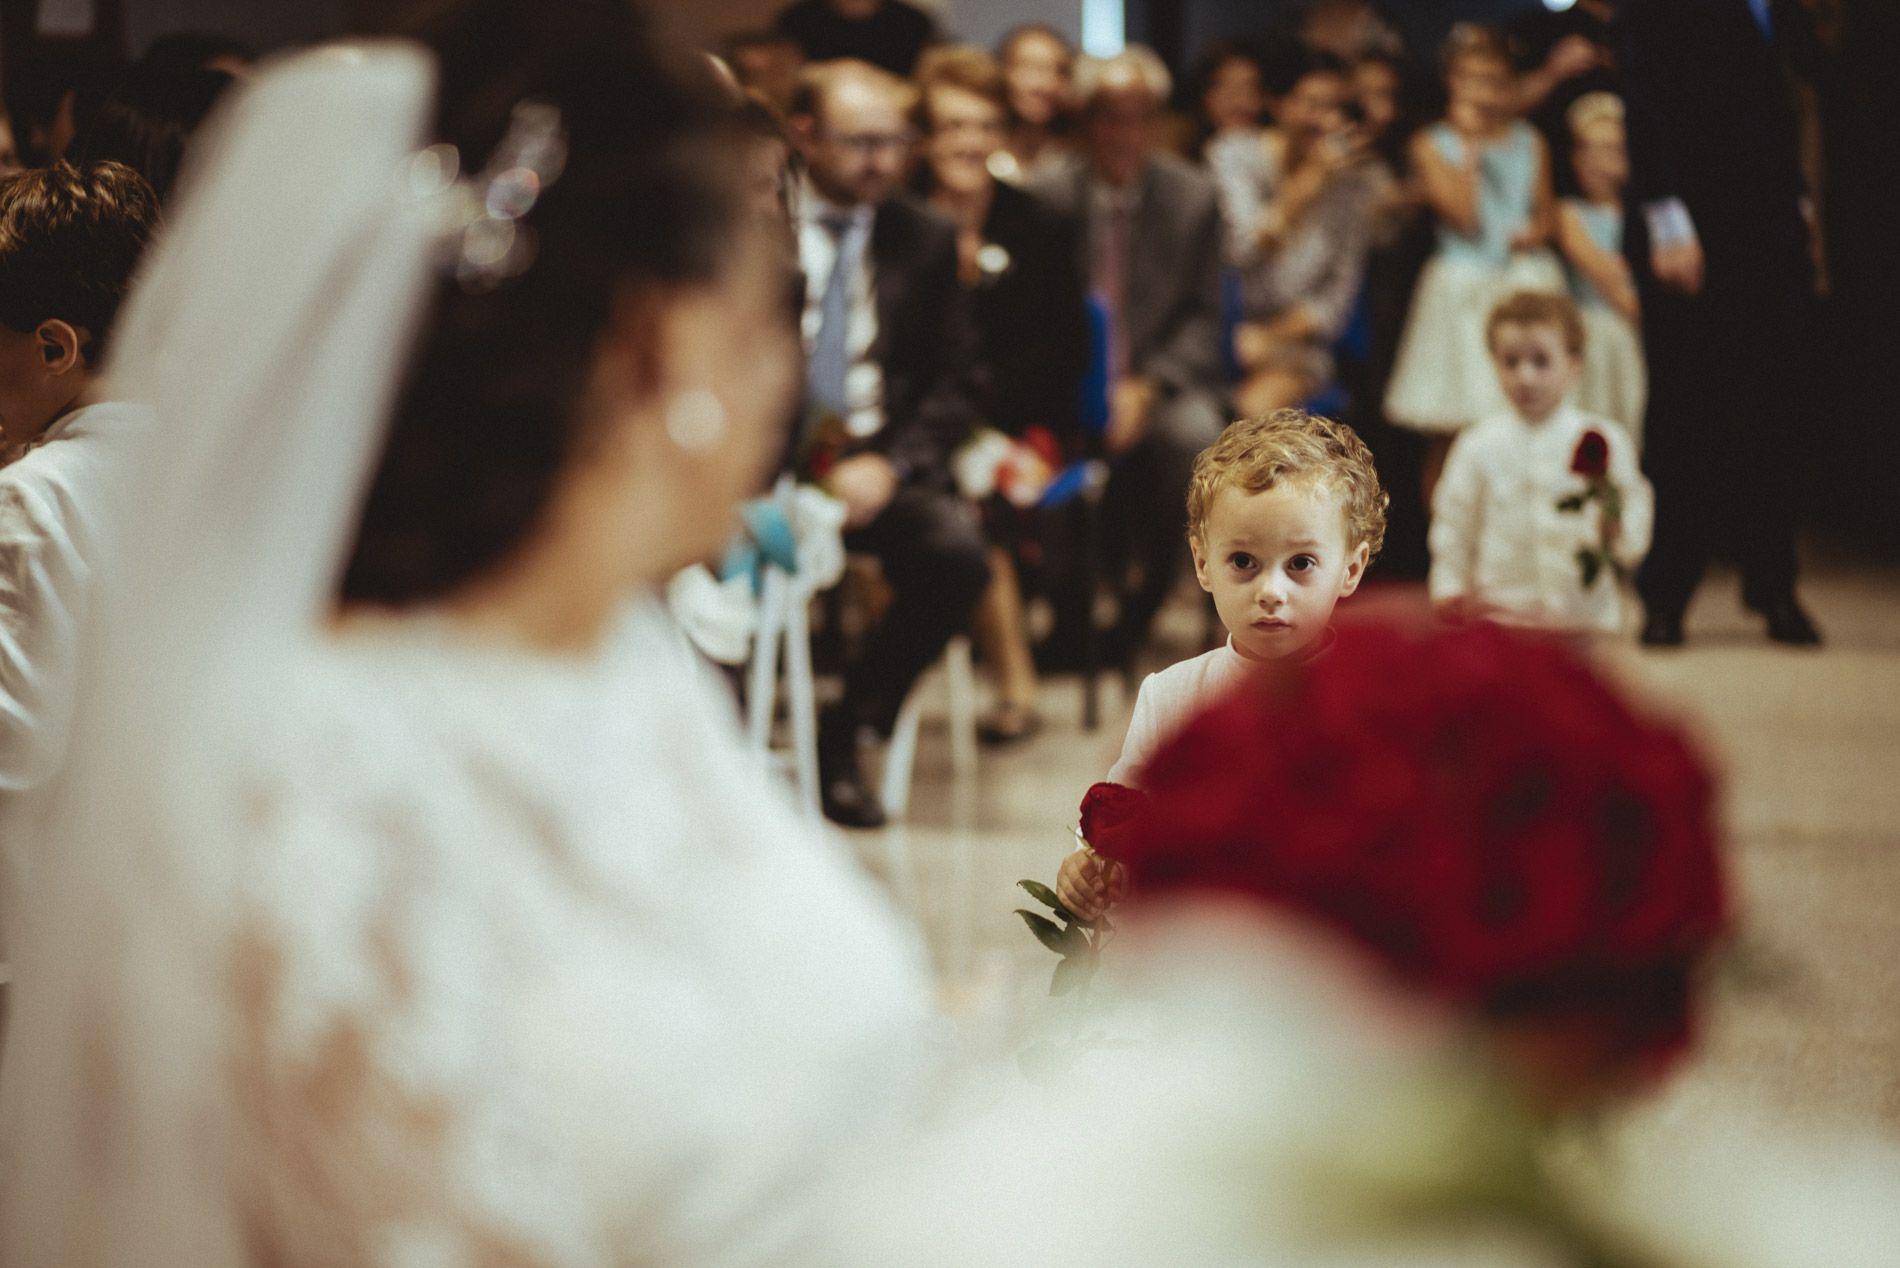 fotografia-boda-santi-miquel-bj-023